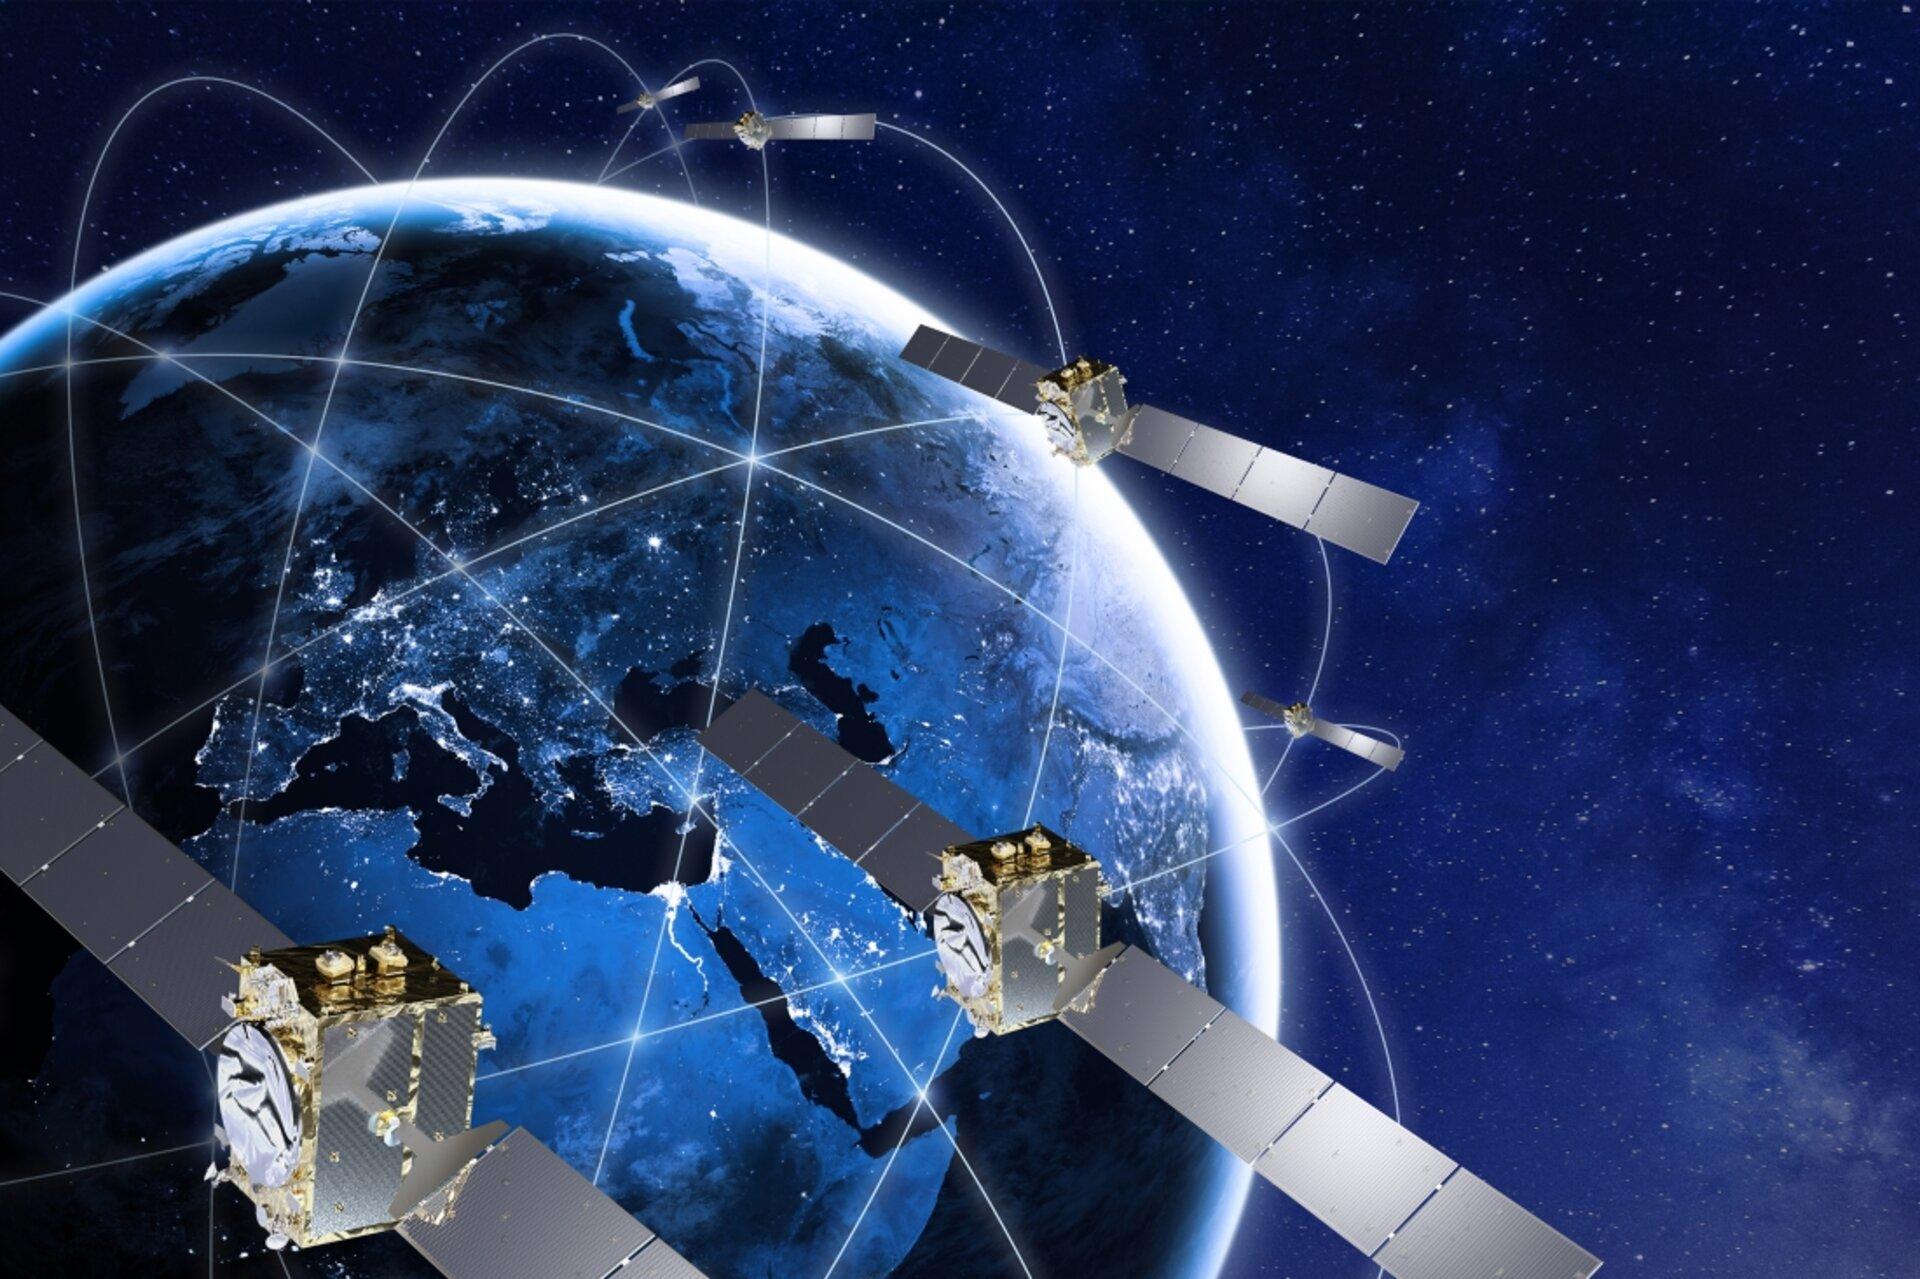 Thales Galileo Second Generation satellites